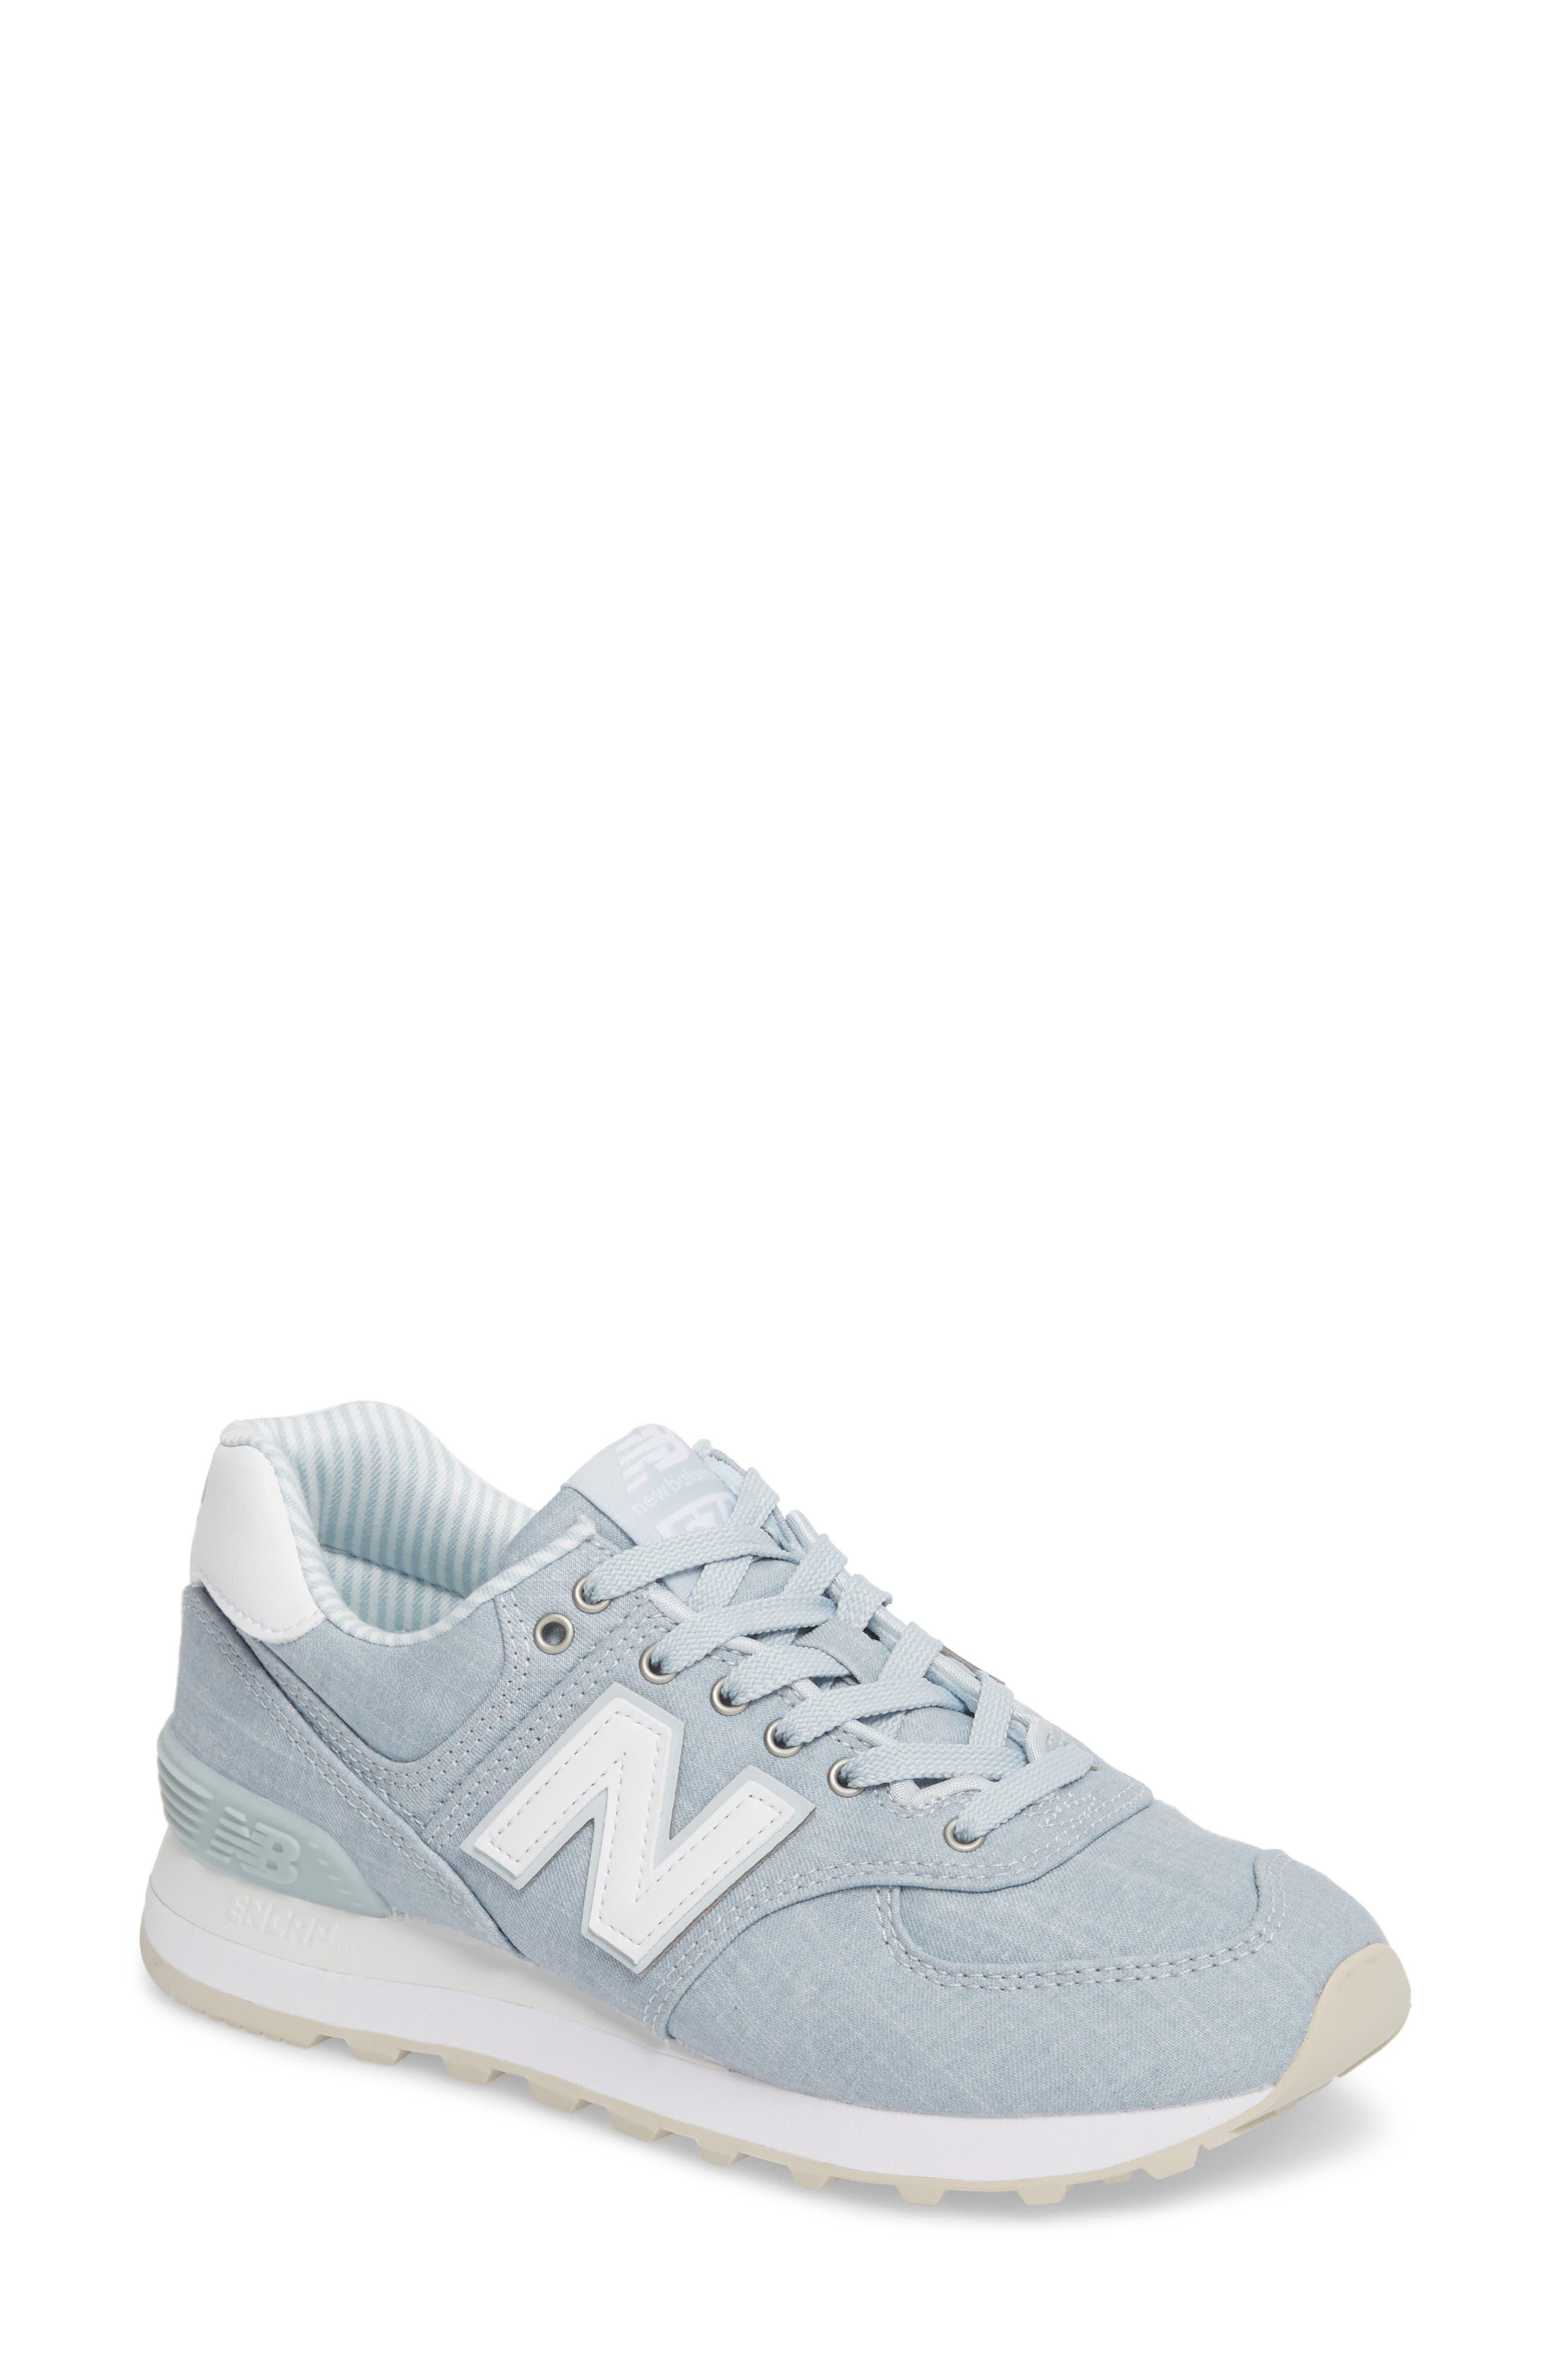 574 Sneaker,                             Main thumbnail 4, color,